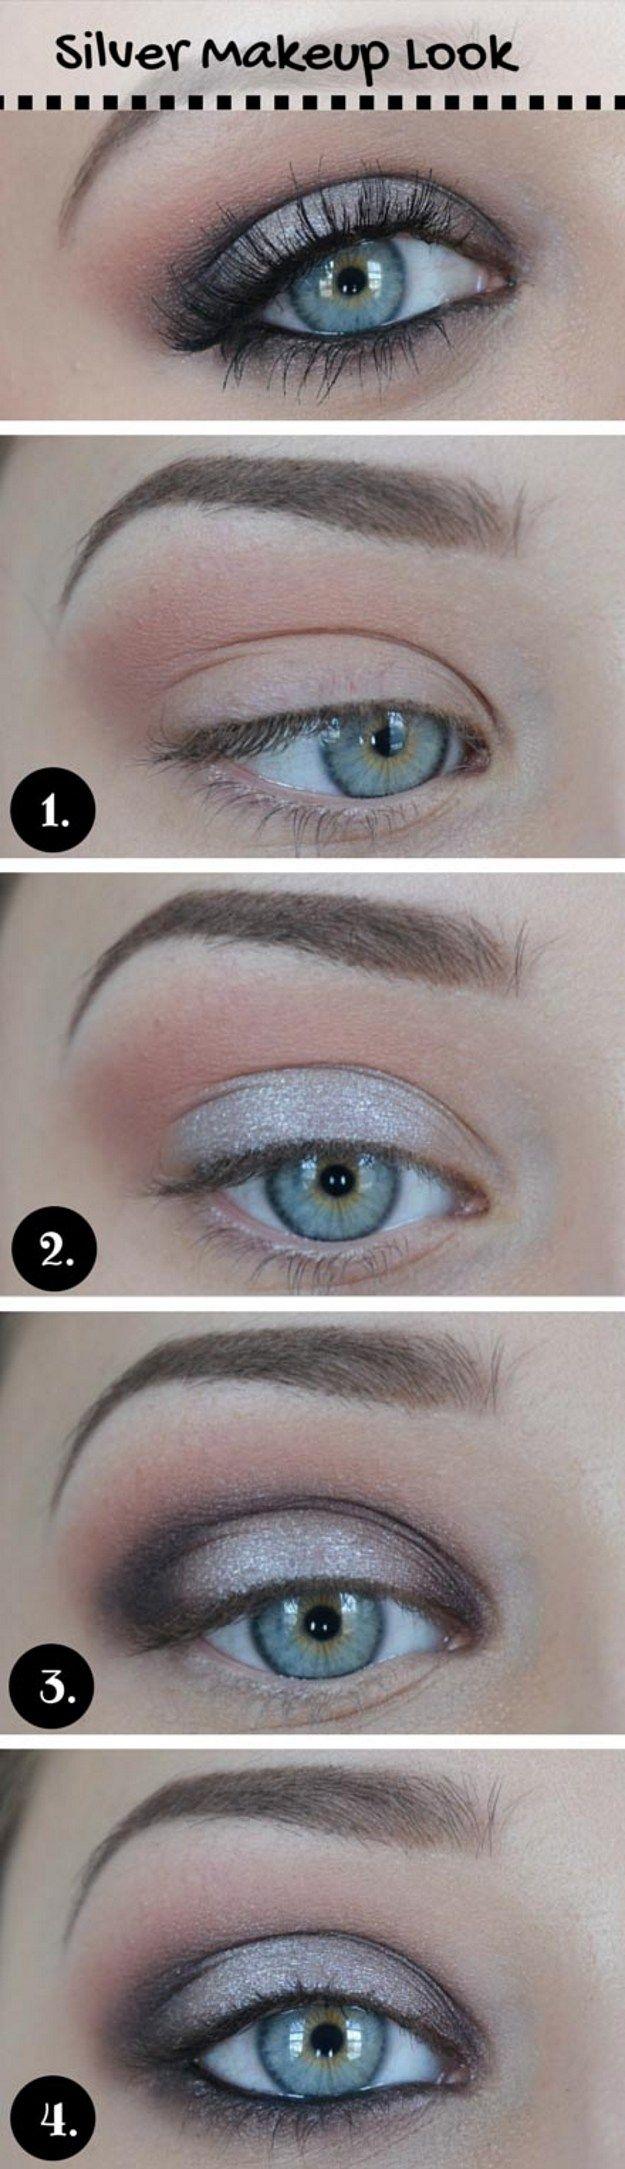 How to Do Silver Eye Makeup | Metallic Eyes